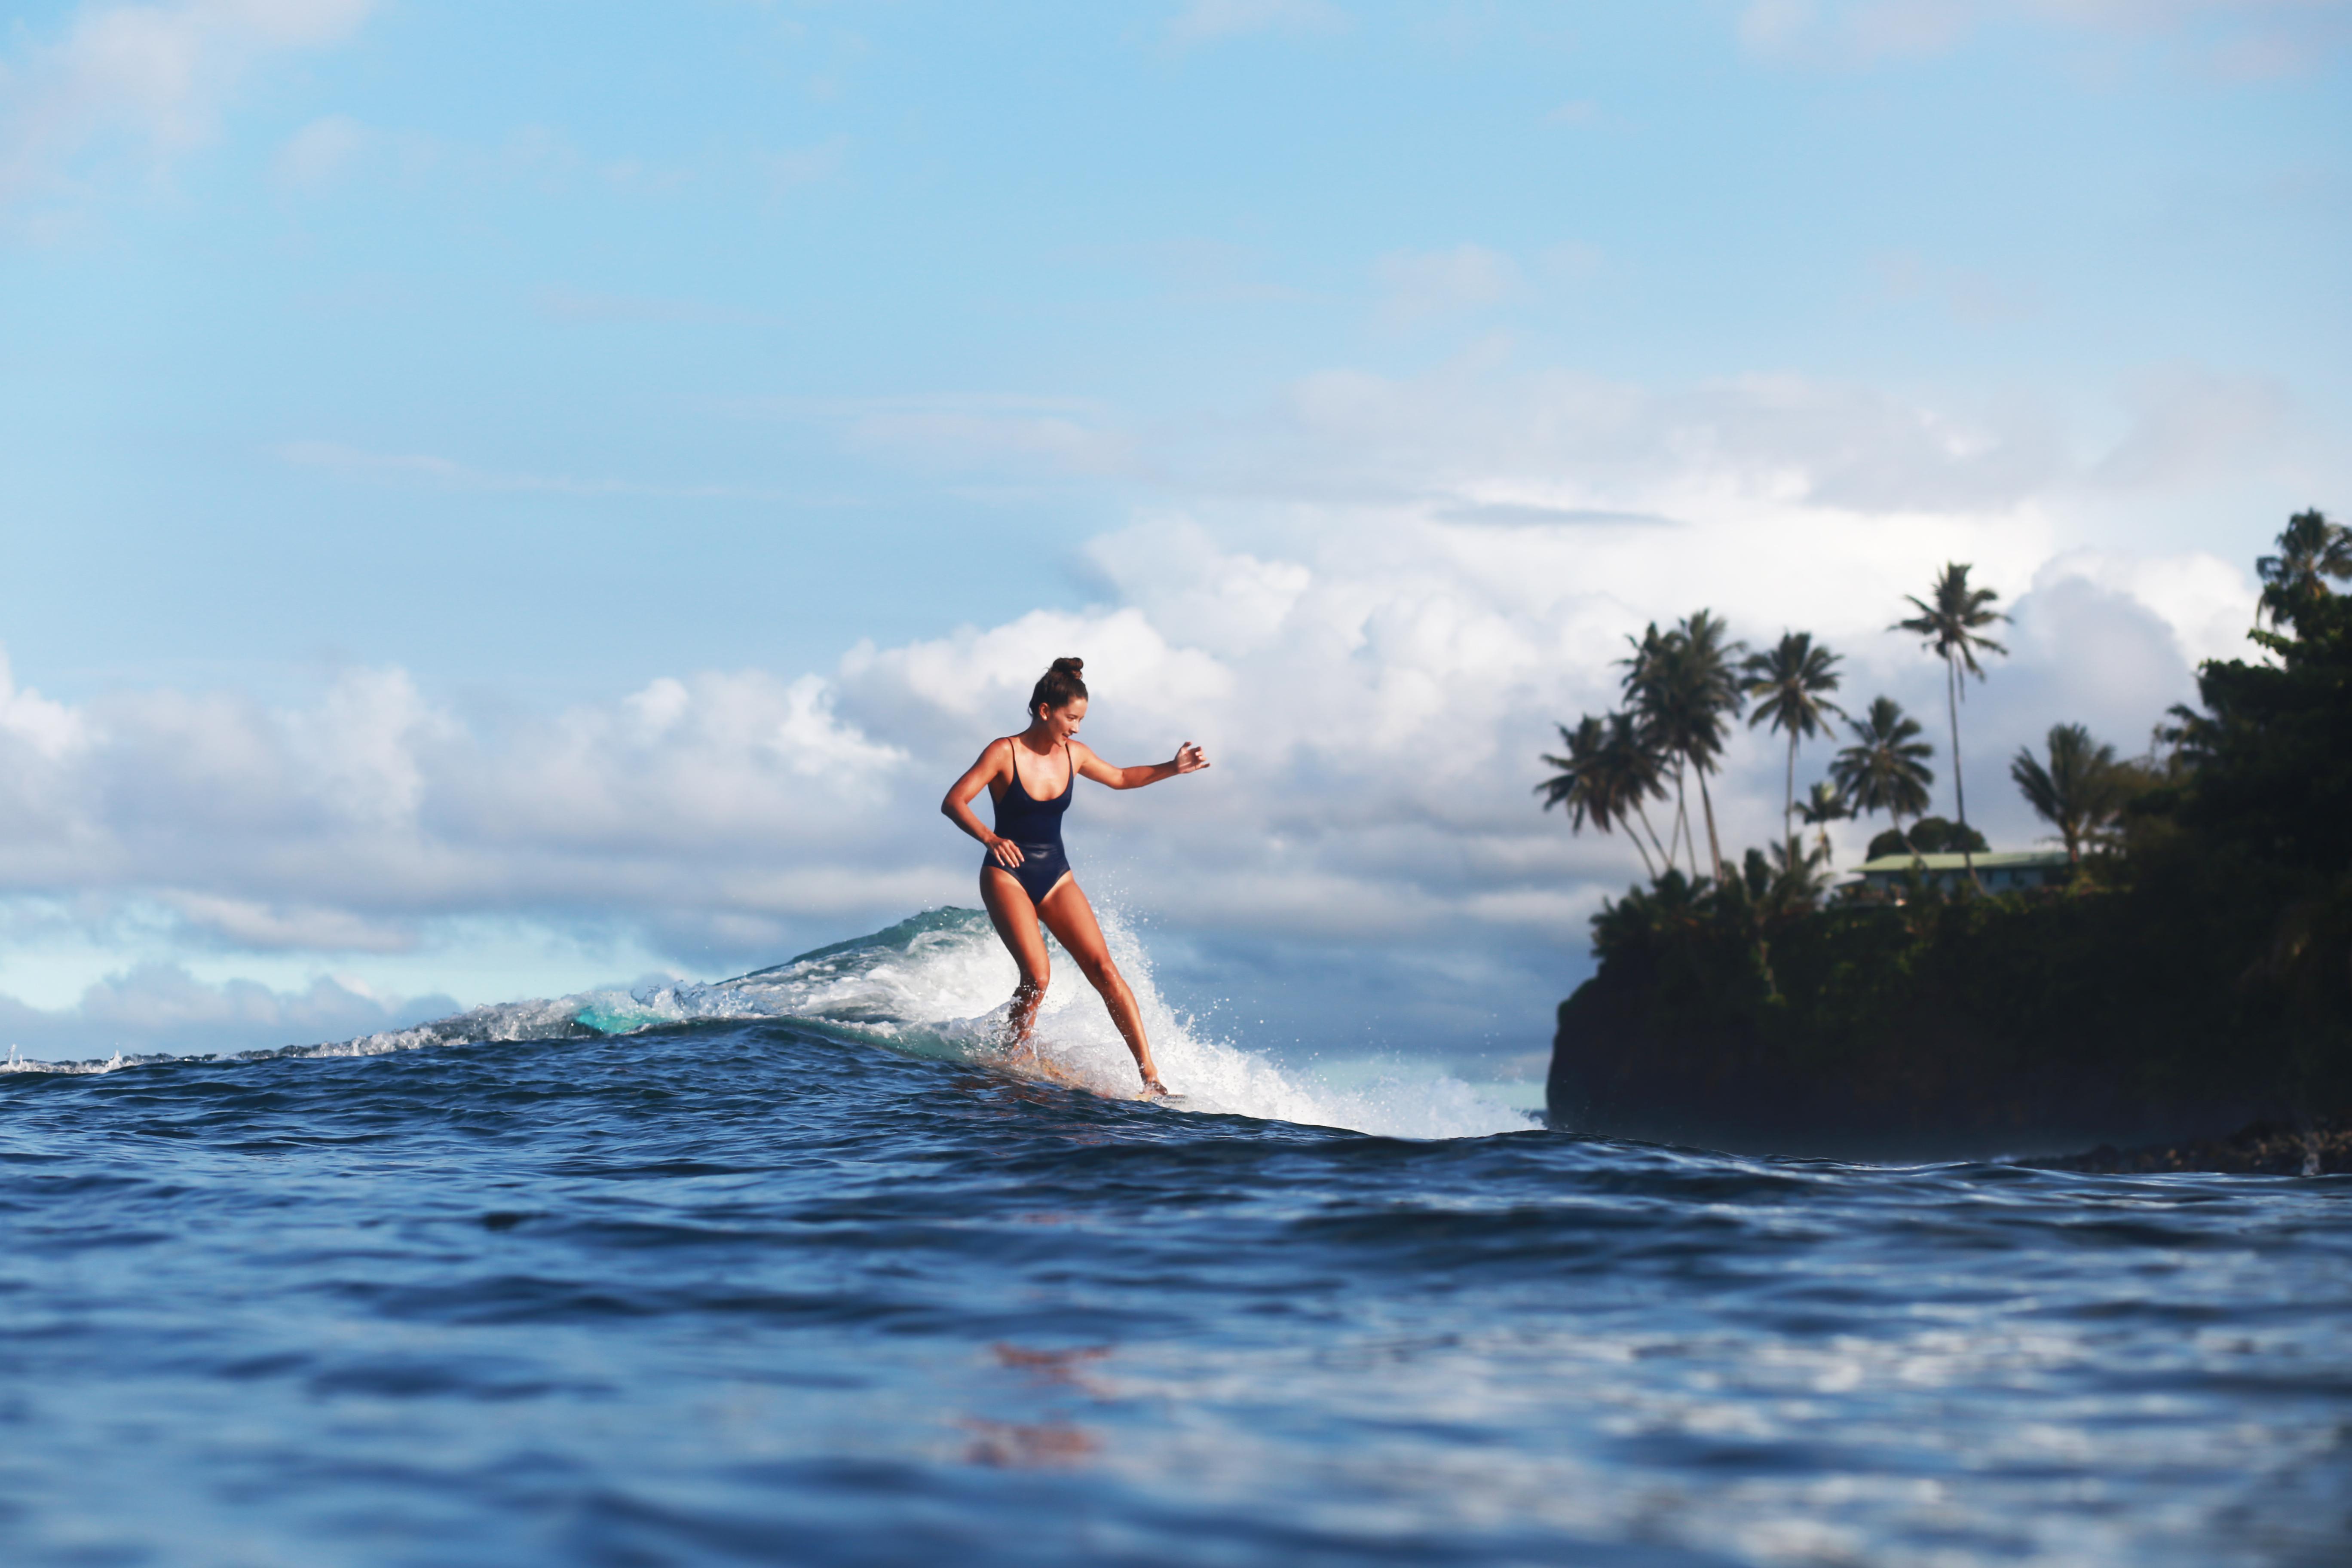 swell-surf-ladyslider-7